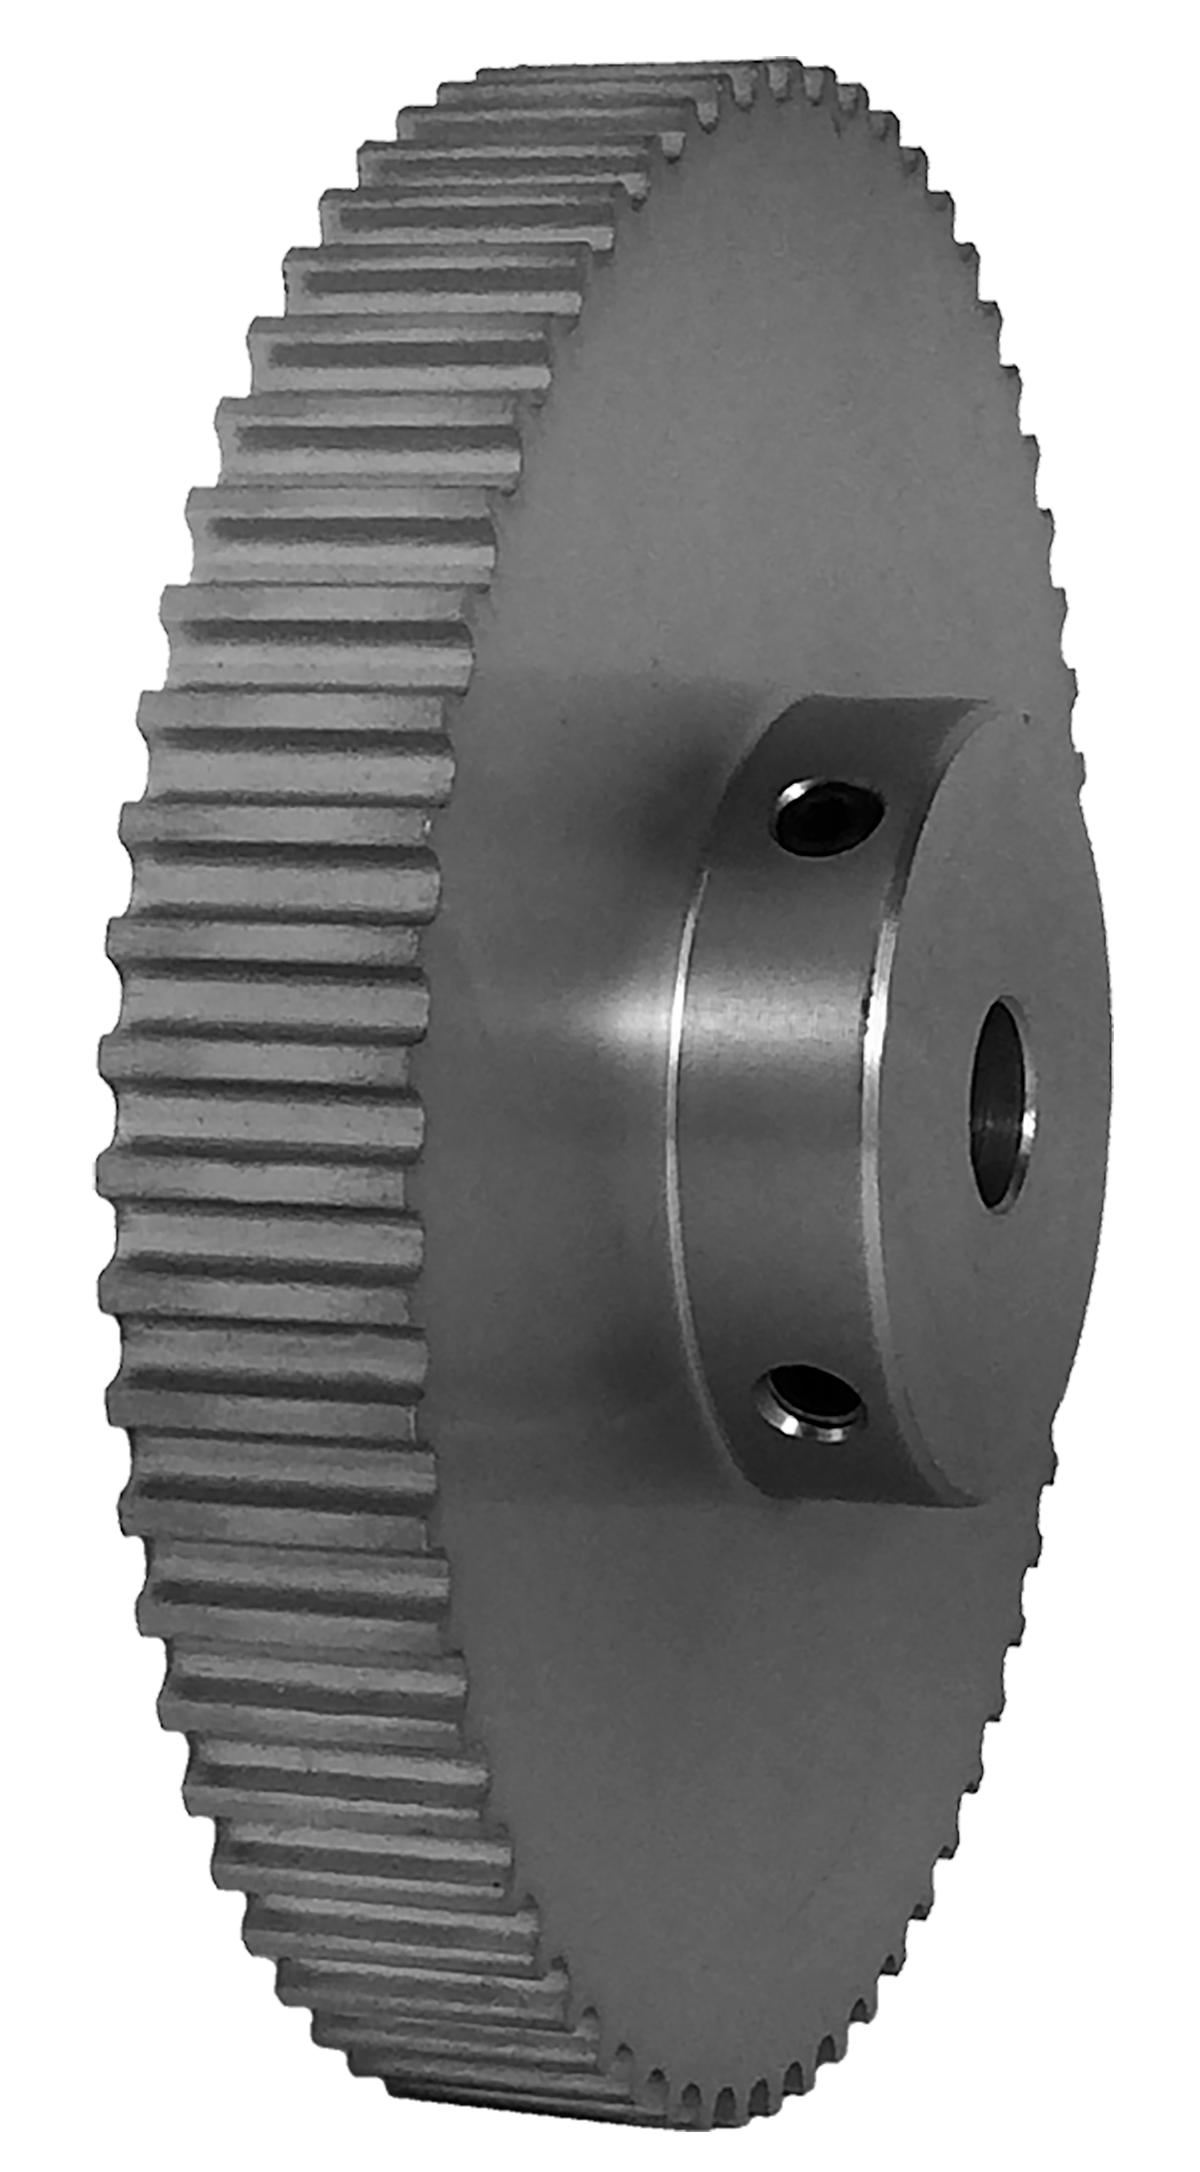 62-5M09-6A5 - Aluminum Powerhouse®HTD® Pulleys